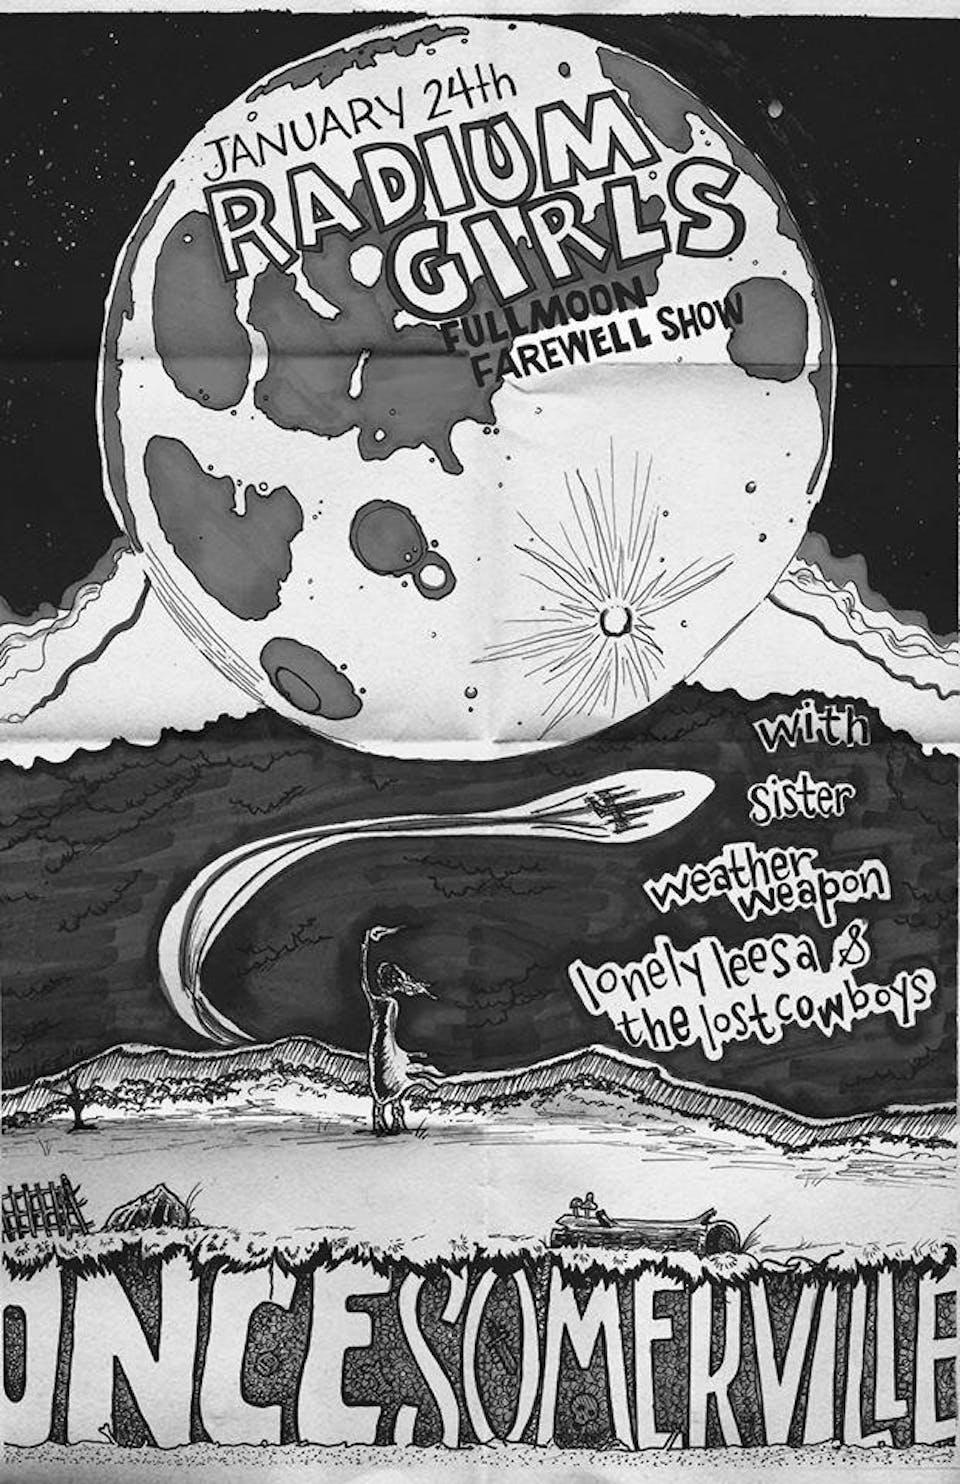 Radium Girls Full Moon Farewell